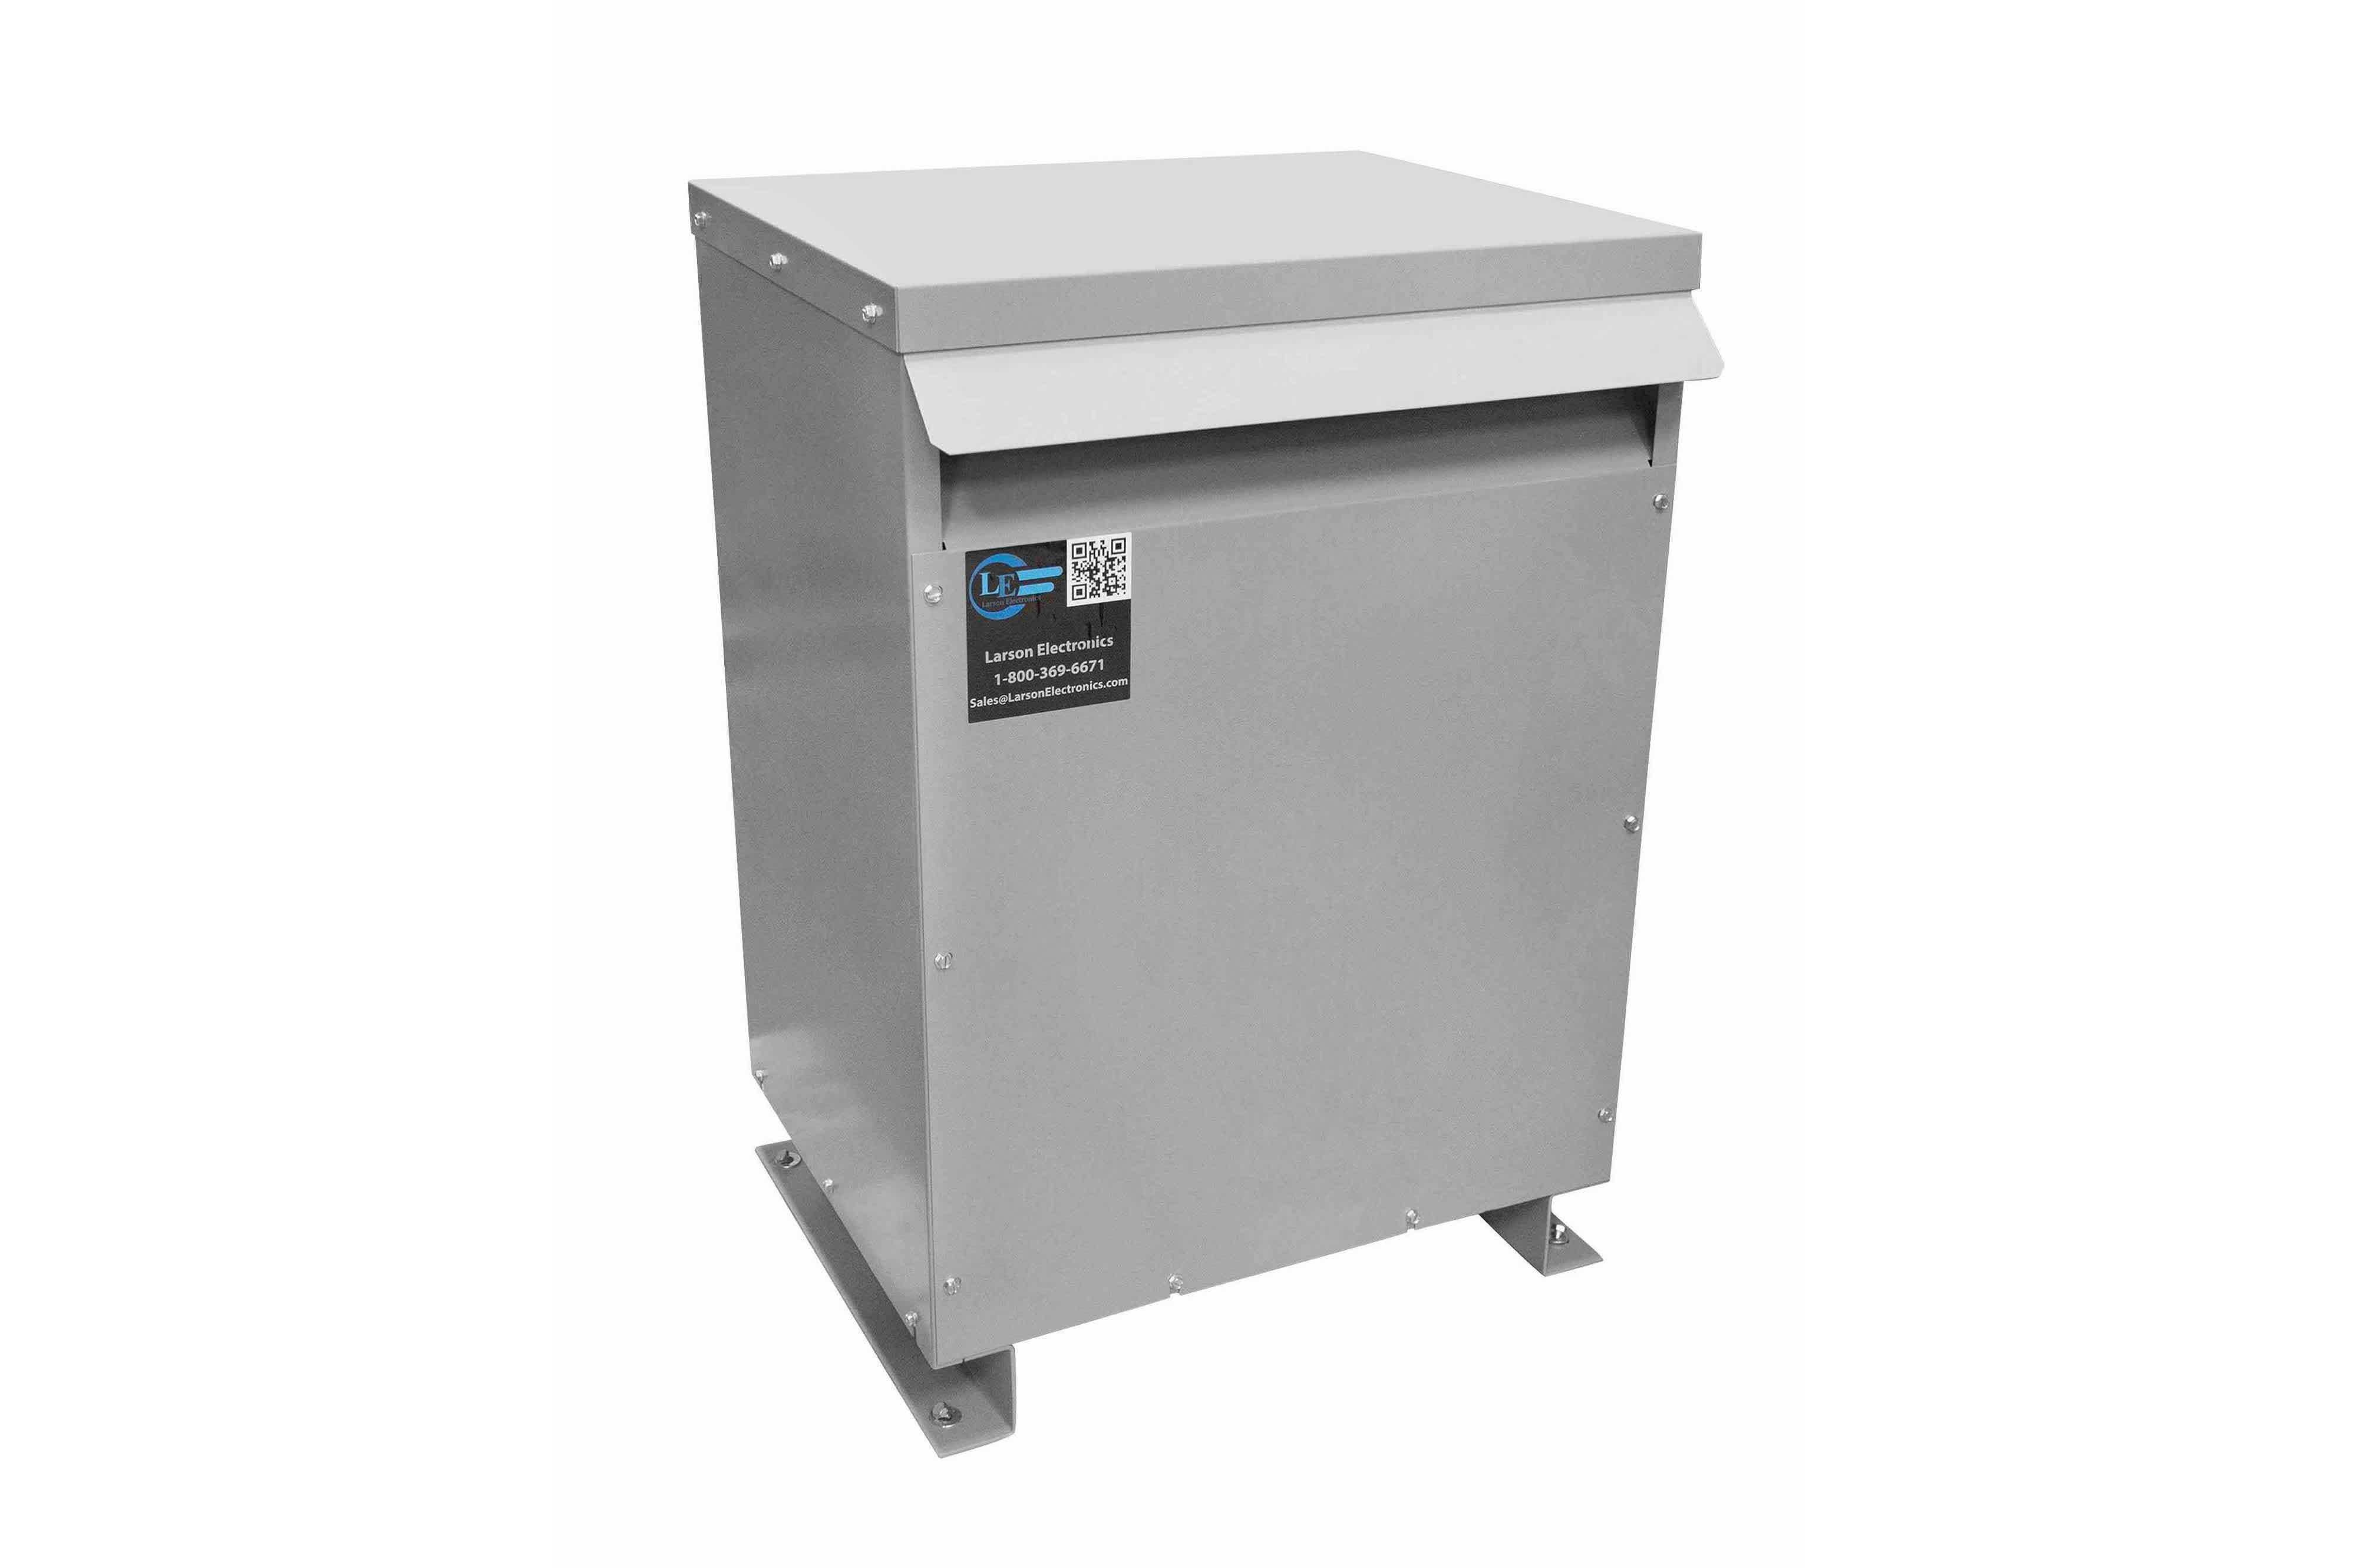 300 kVA 3PH Isolation Transformer, 380V Wye Primary, 208Y/120 Wye-N Secondary, N3R, Ventilated, 60 Hz